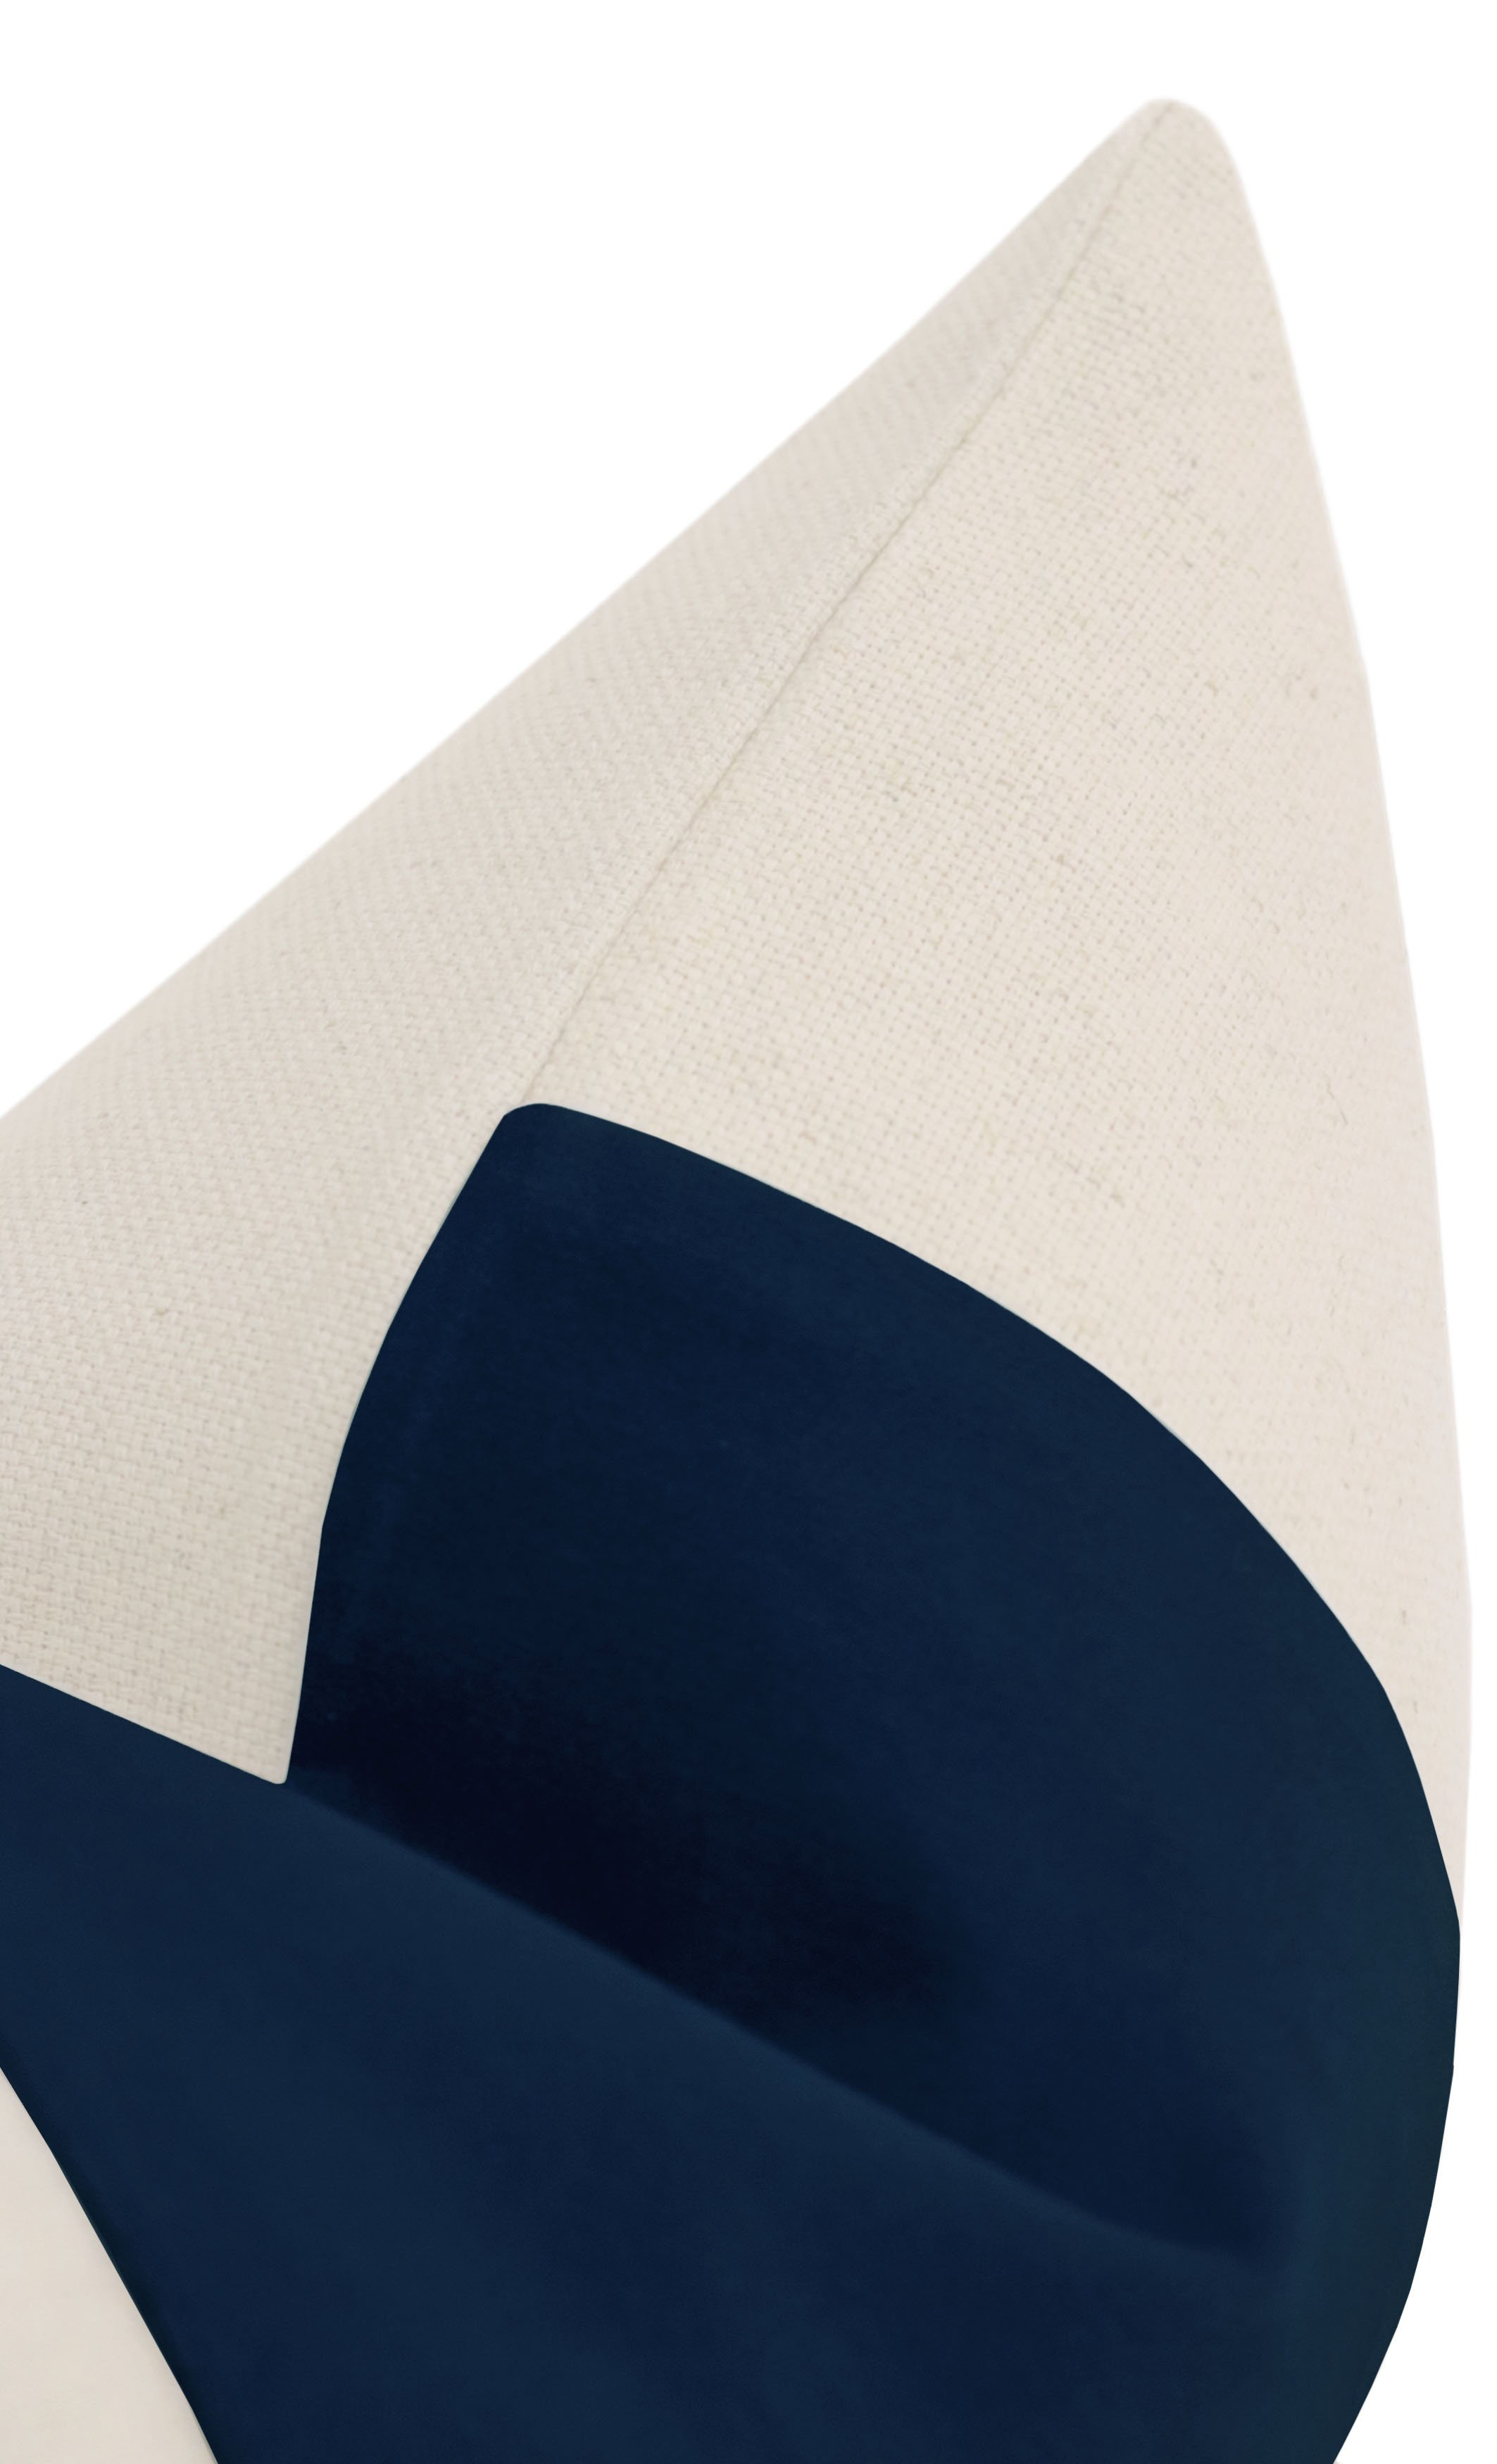 "The Little Lumbar :: PANEL Signature Velvet // Sapphire - 20"" x 20"""